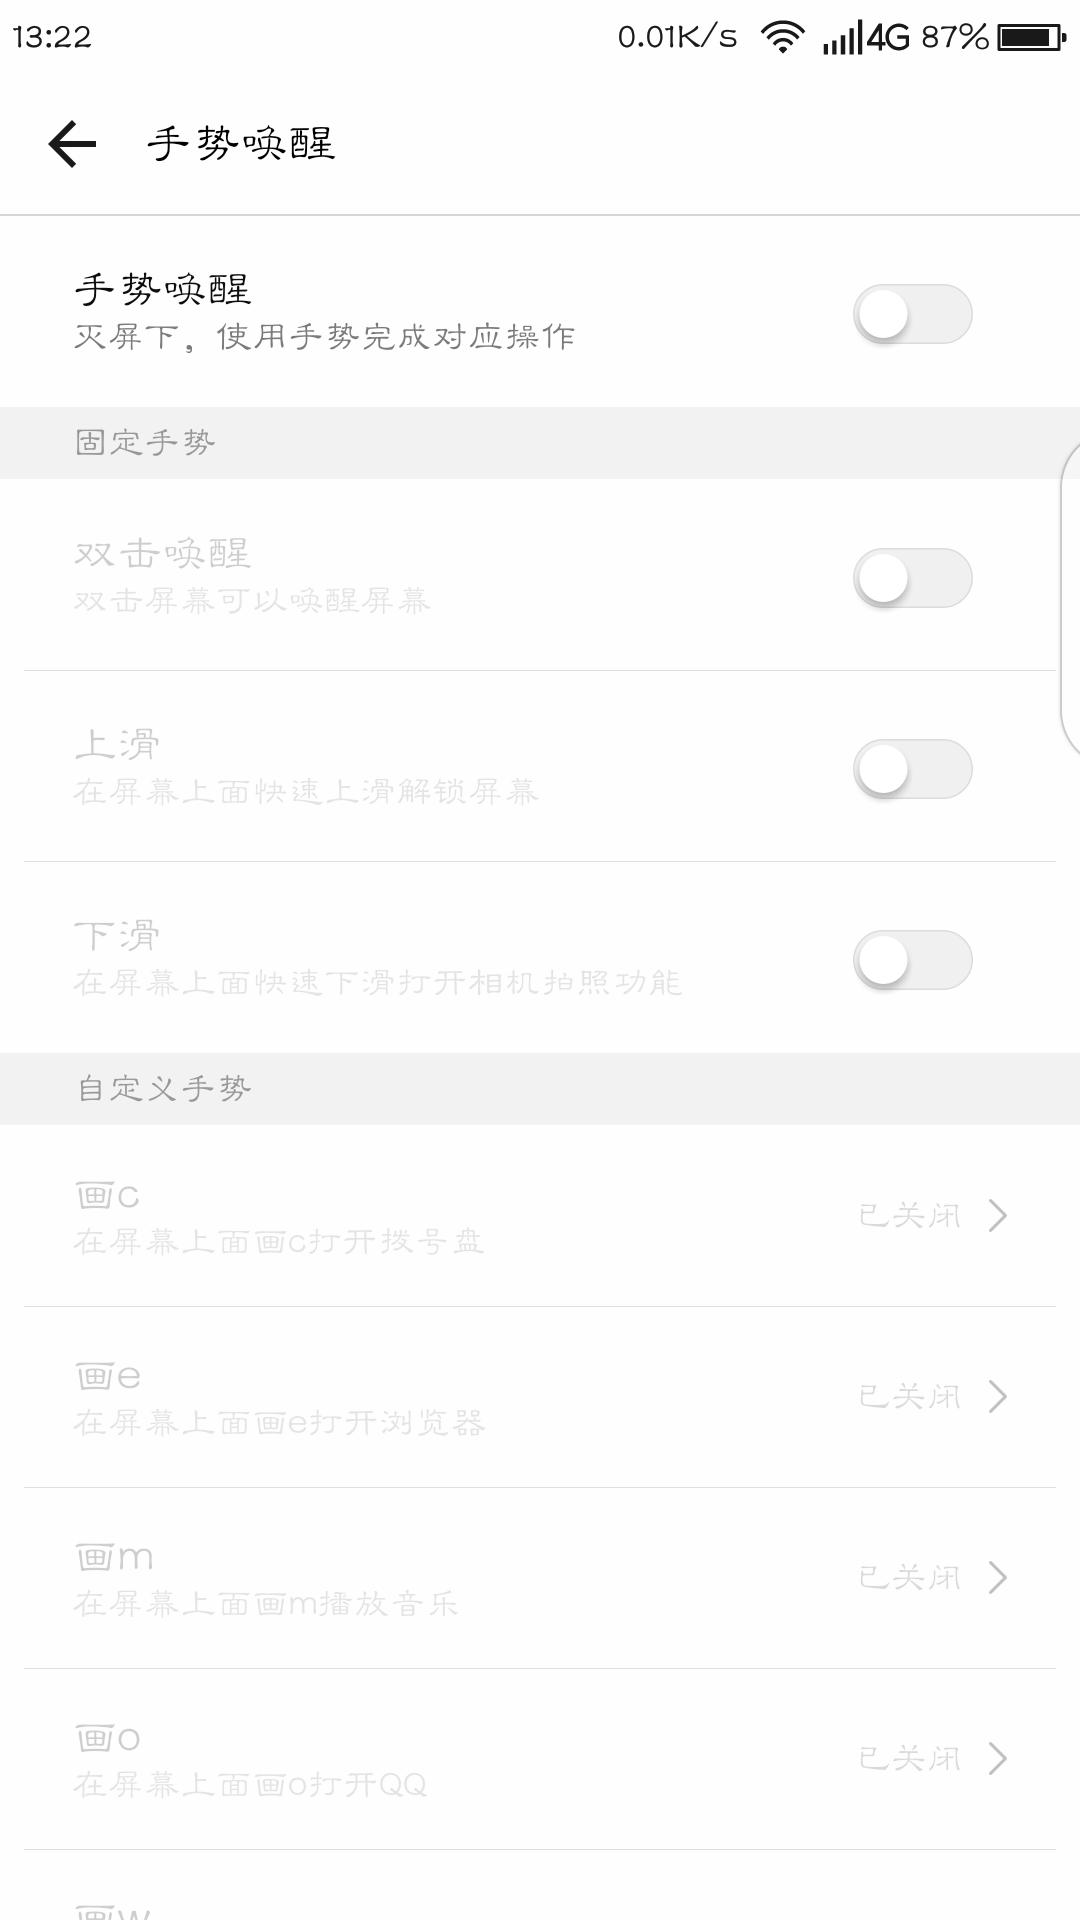 Screenshot_2018-04-21-13-22-22.png